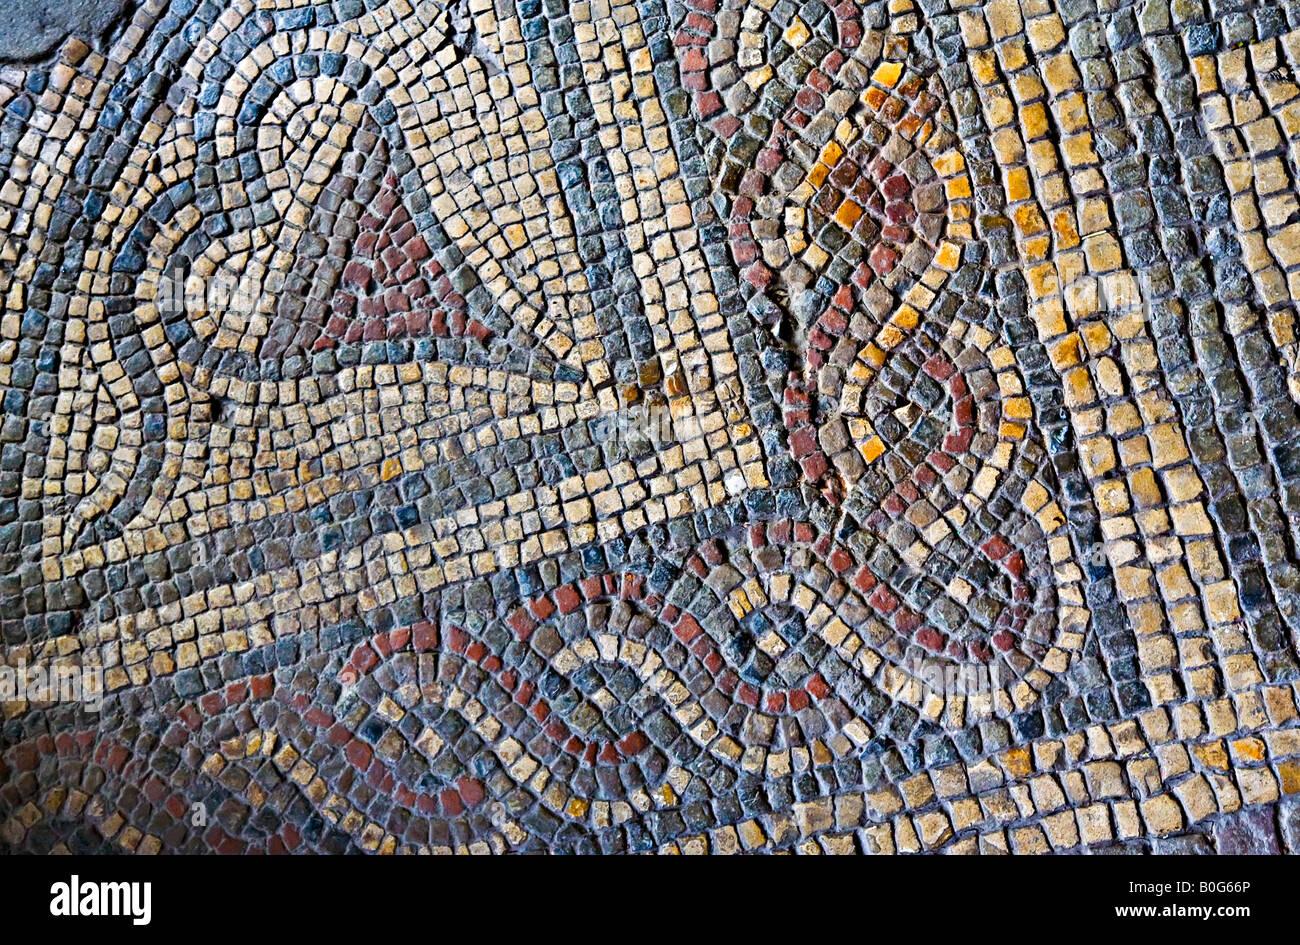 Roman floor mosaic discovered at Caerwent Wales UK - Stock Image